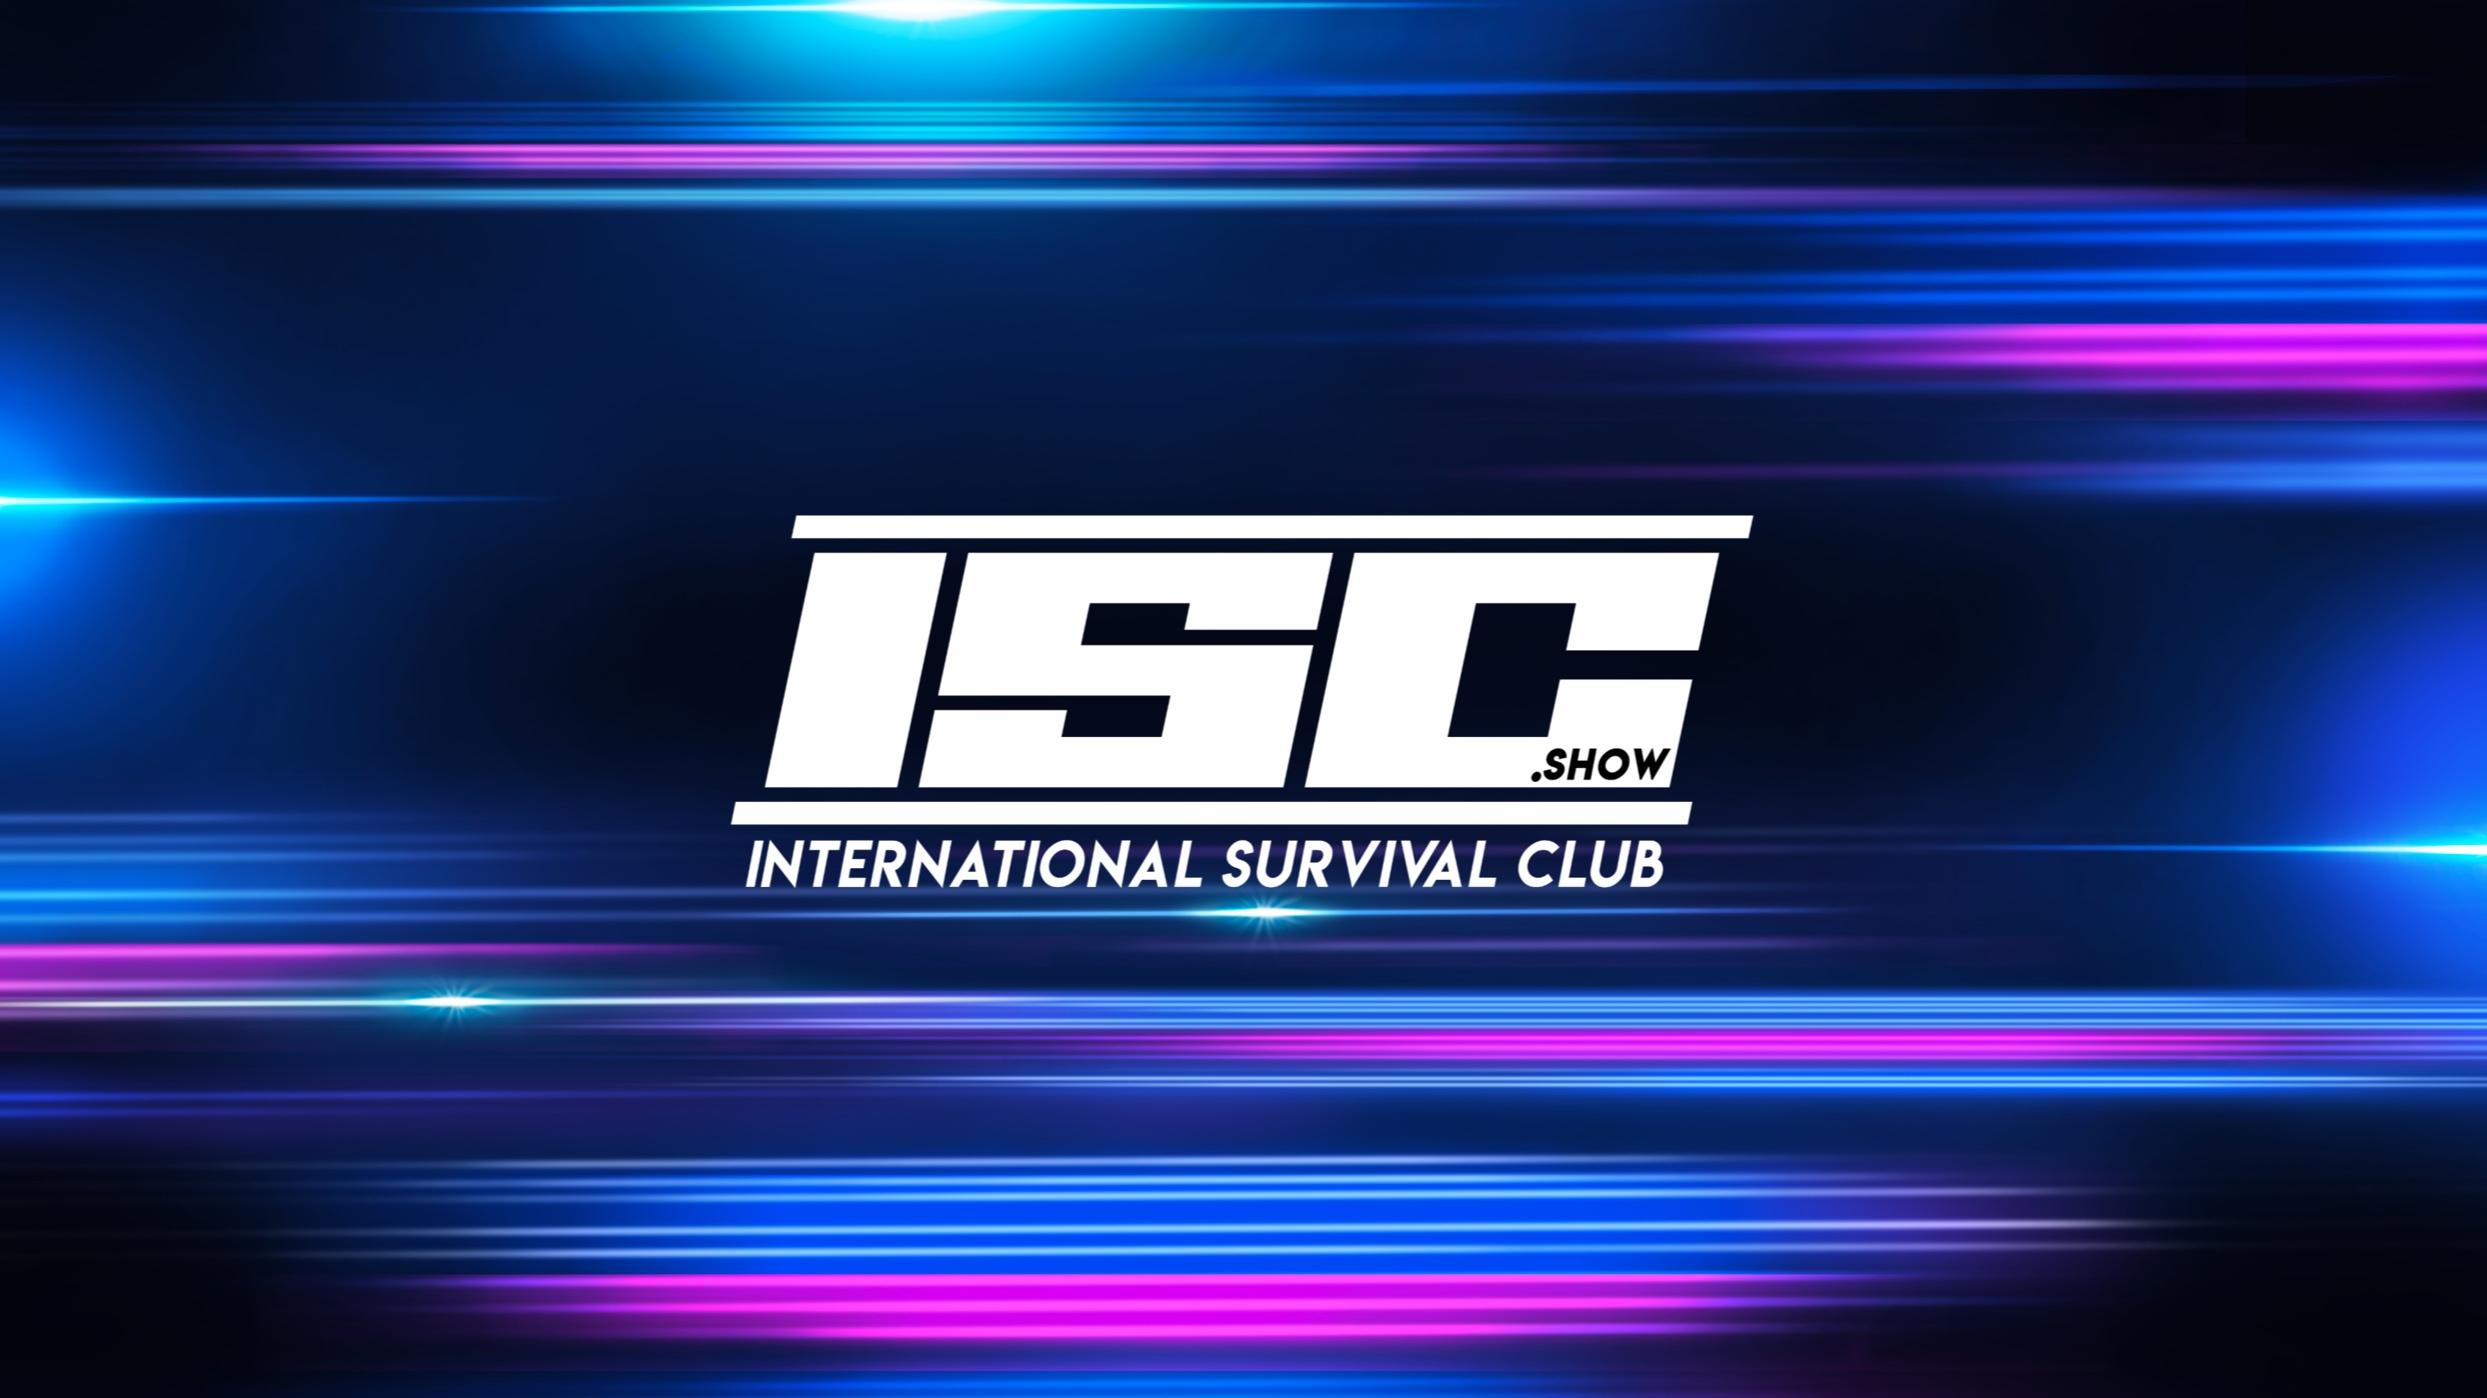 ISC.show - International Survival Club